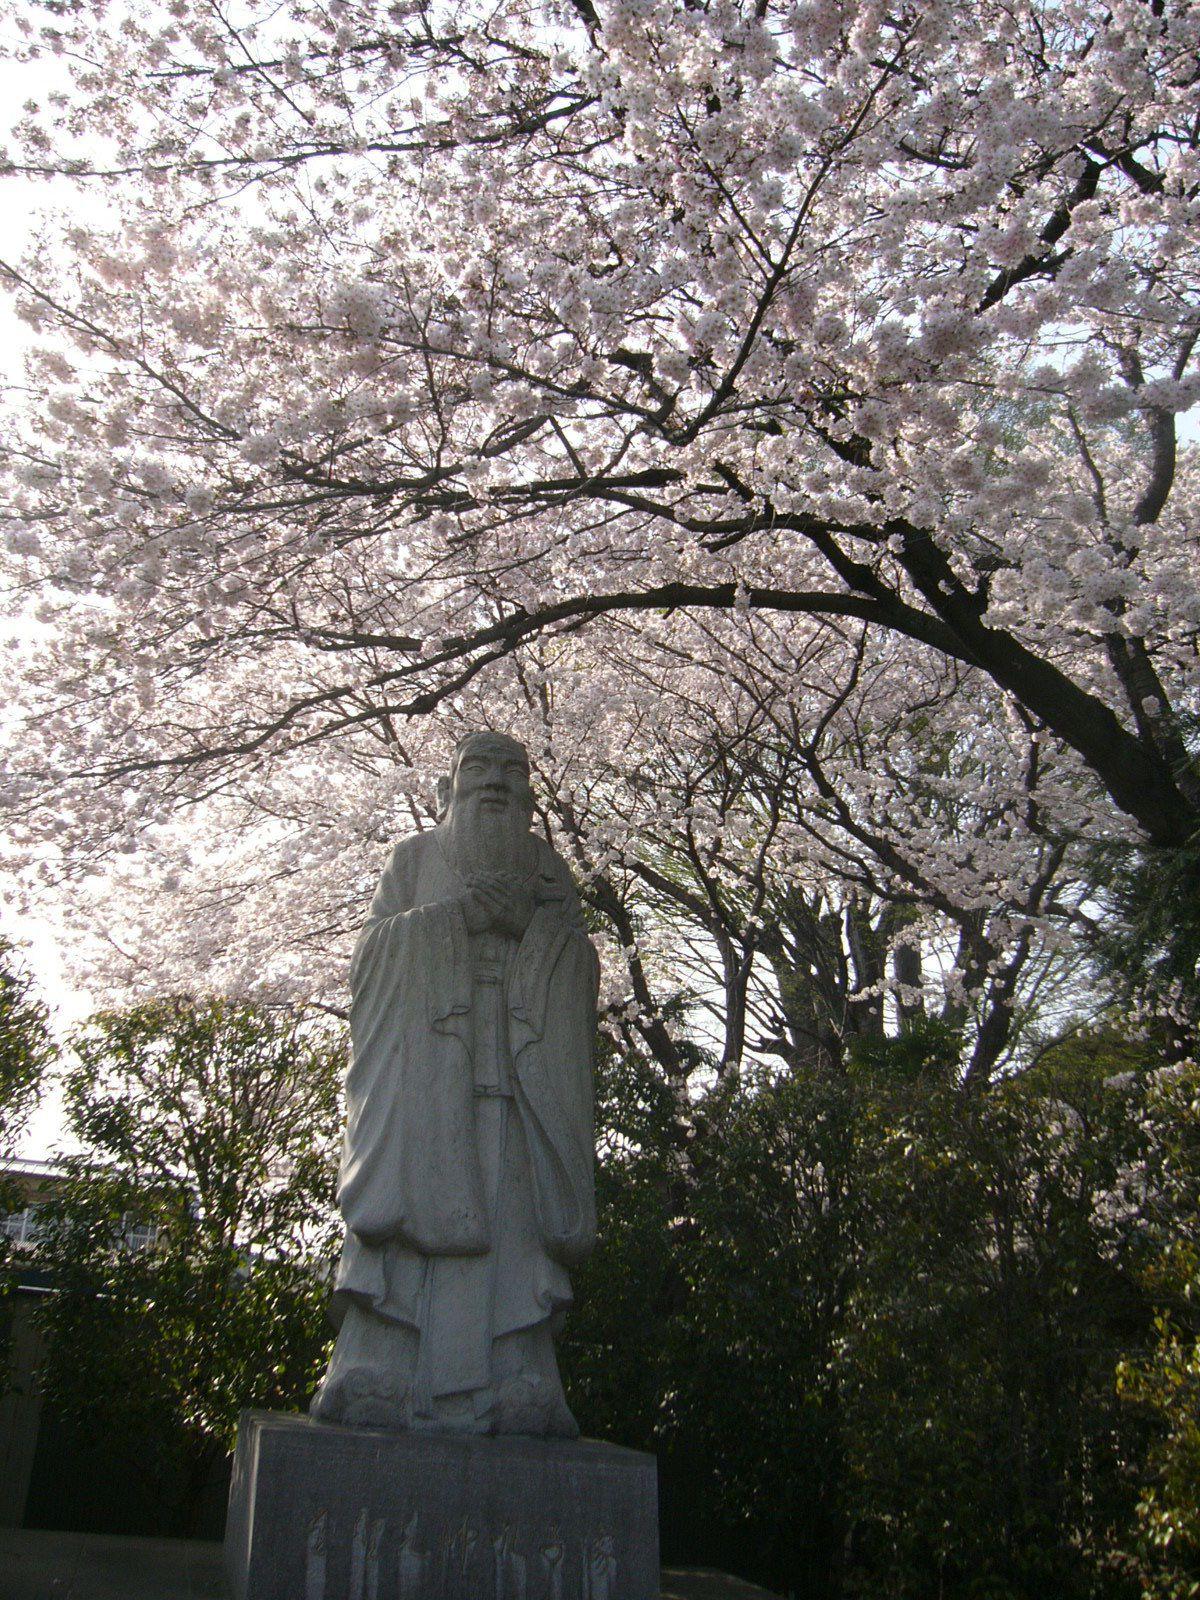 Ashikaga Gakko a hitoric site(Confucius)